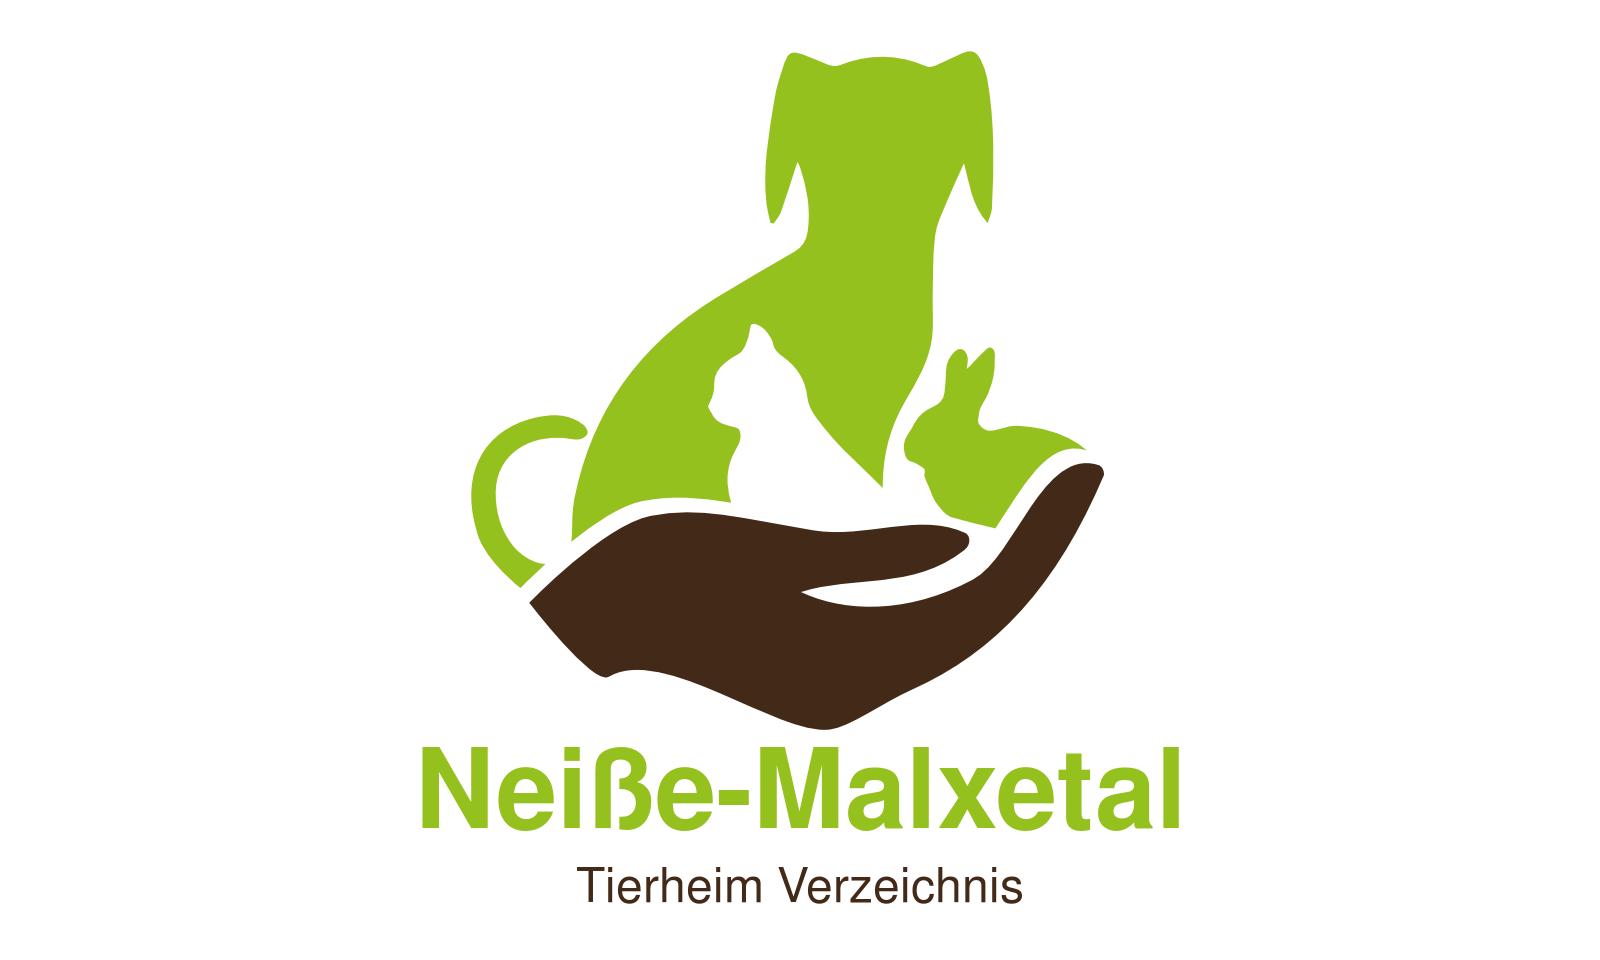 Tierheim Neiße-Malxetal